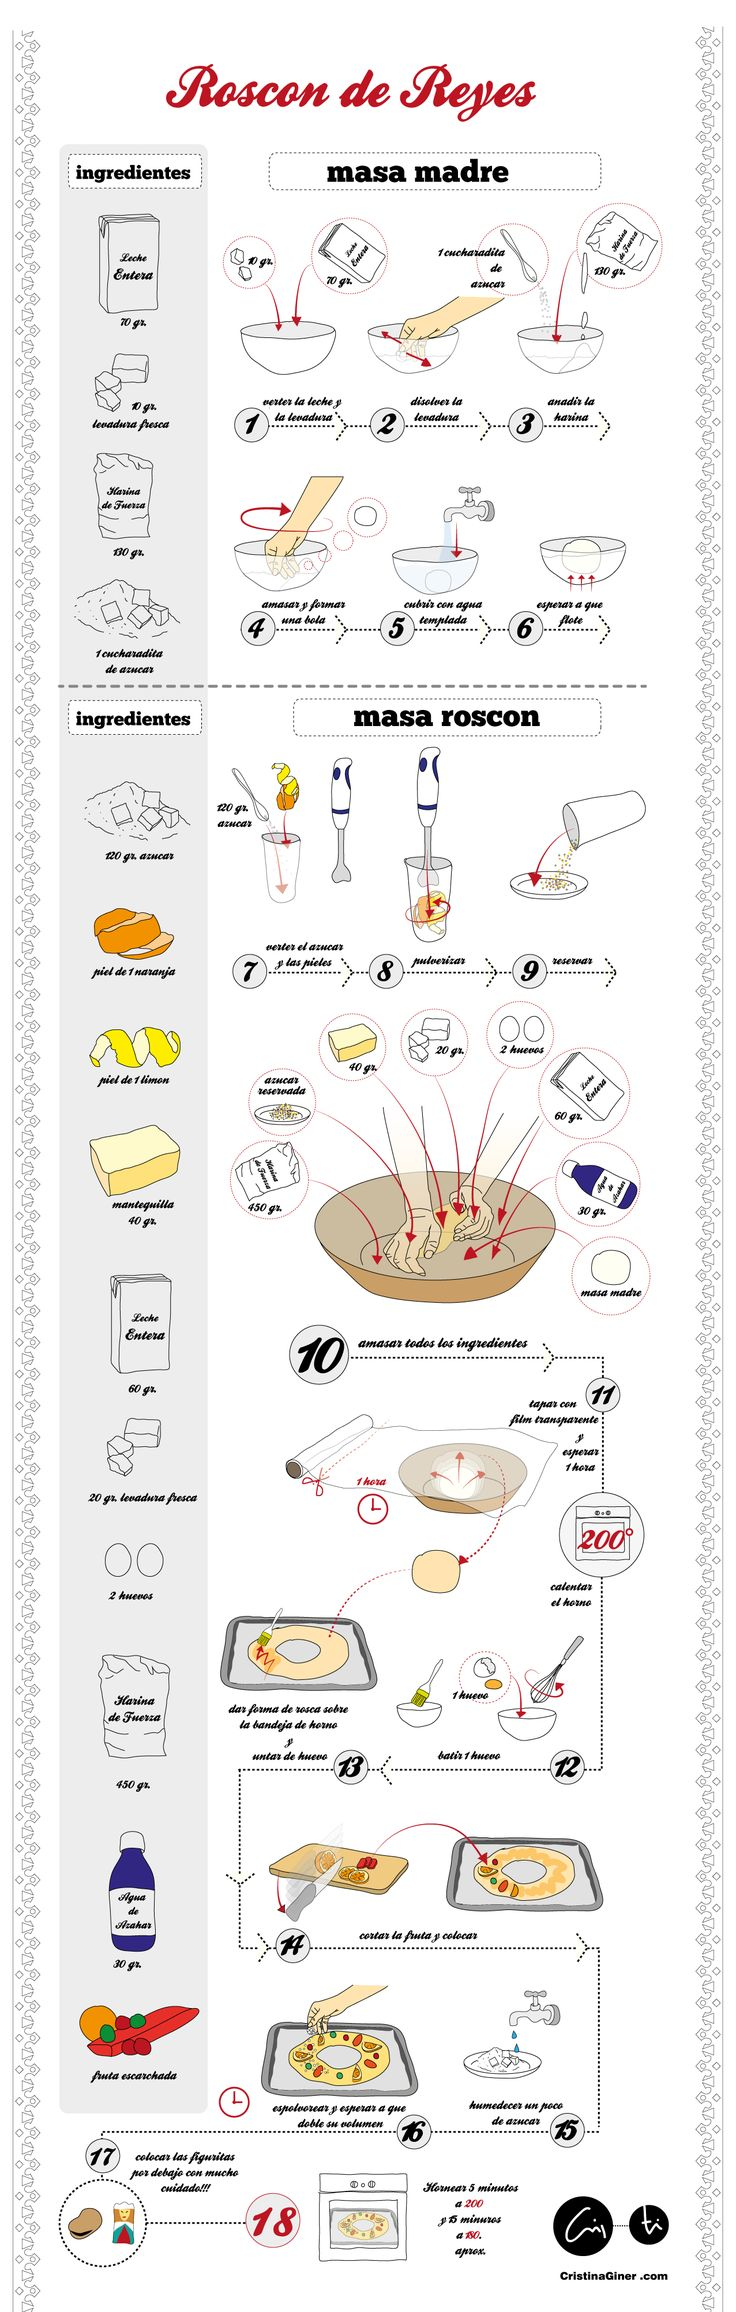 A vector infographic. Roscon de Reyes illustrated recipe